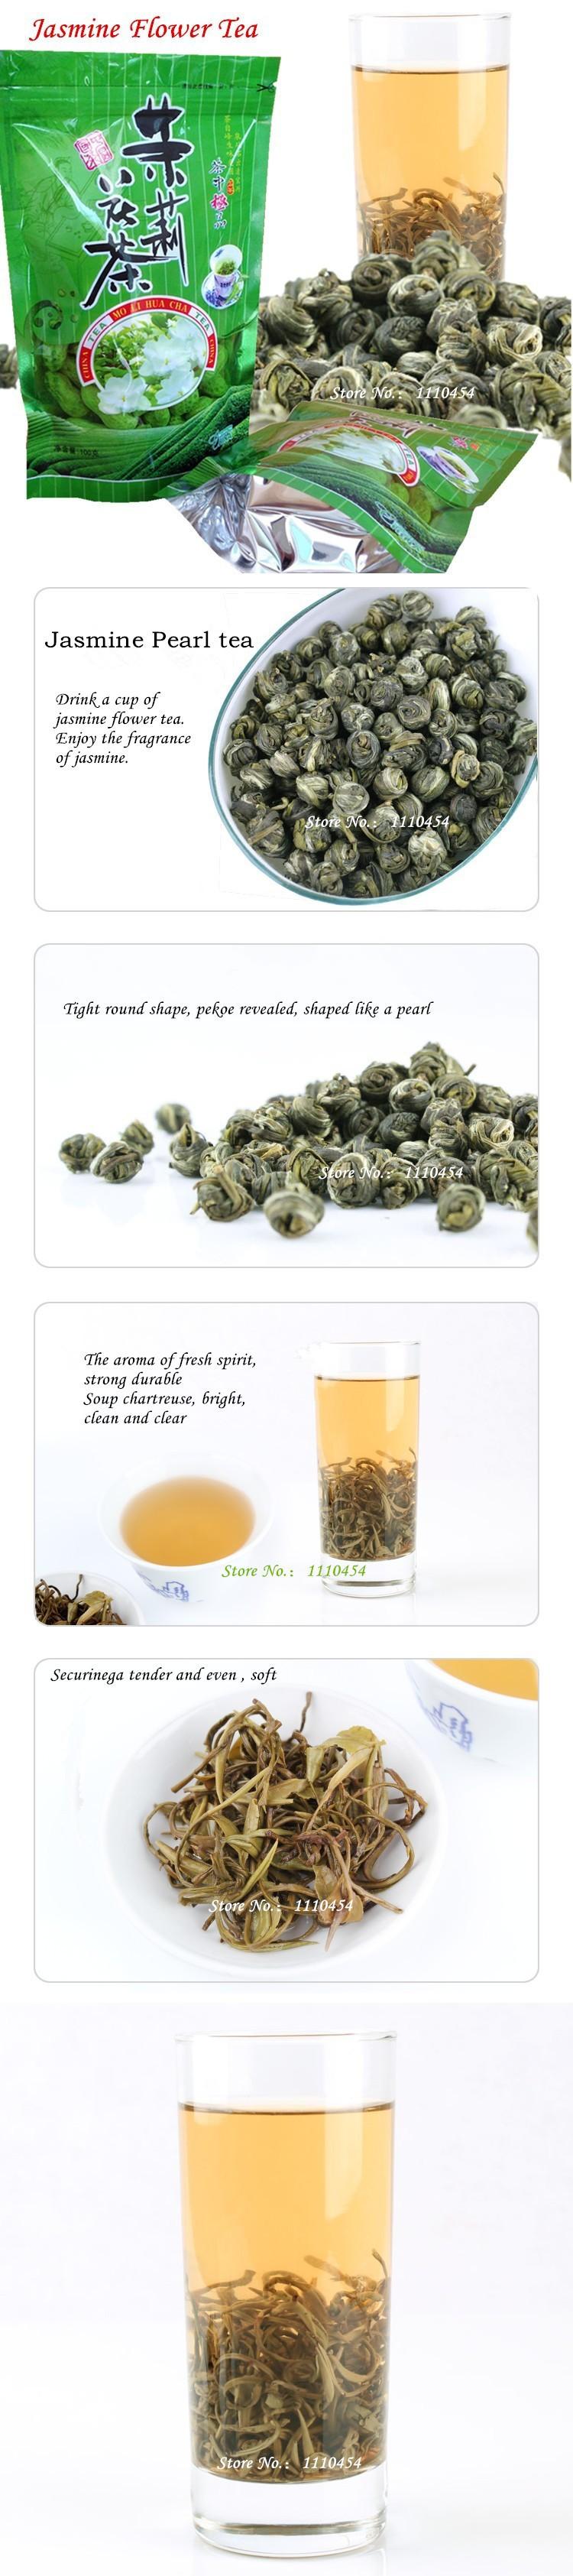 Wholesale High quality Jasmine Flower Tea 100g Premium Jasmine Pearl Chinese Organic Green Tea Hardcover scented tea